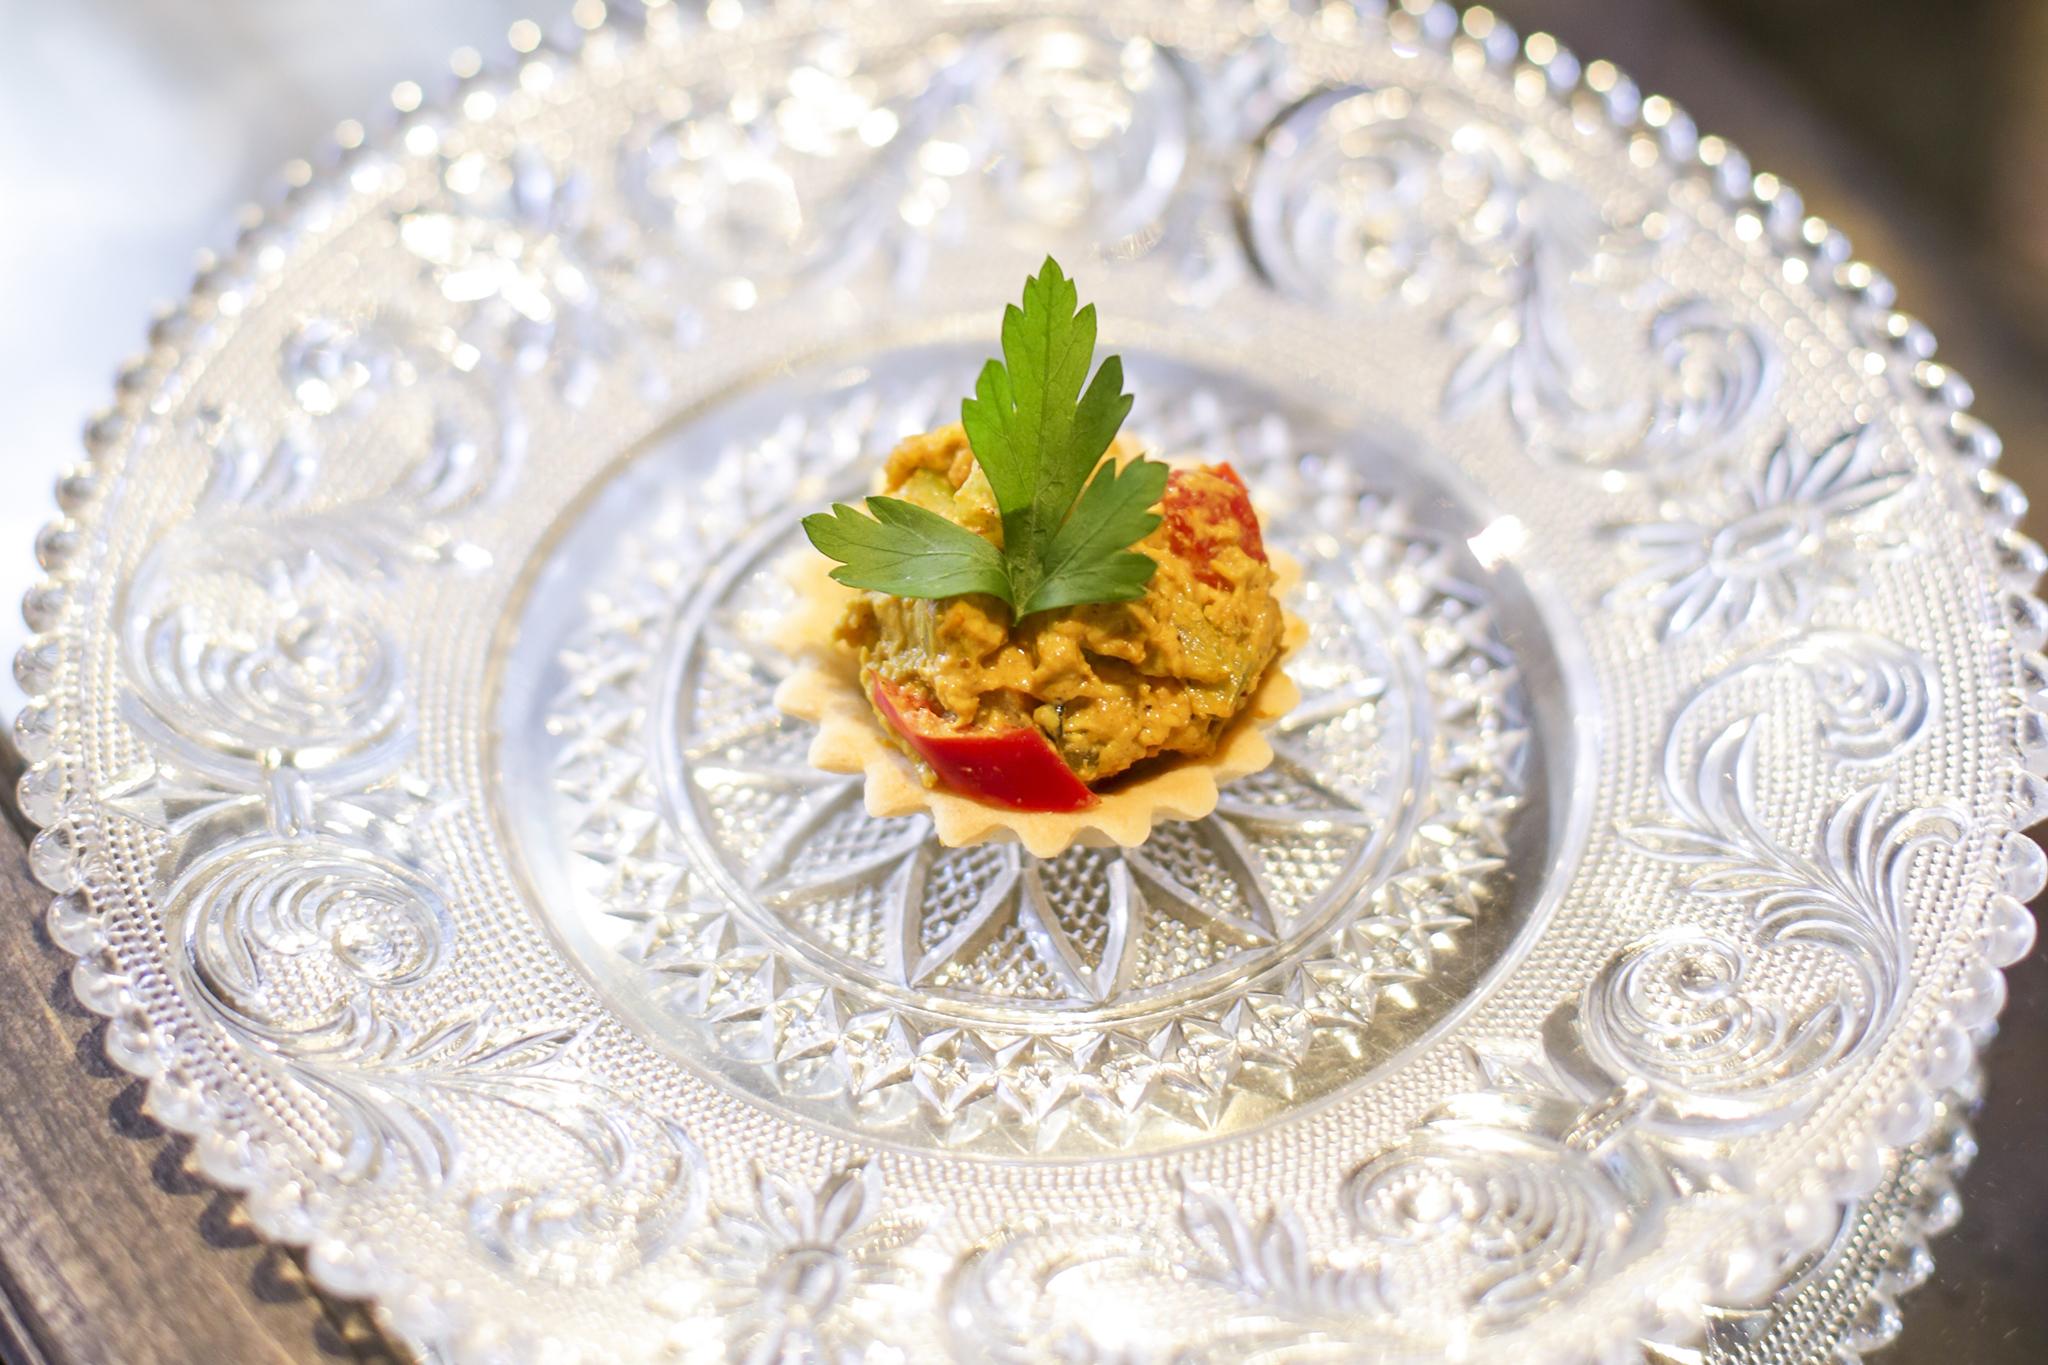 Chicken curry salad tarts atJanamTea